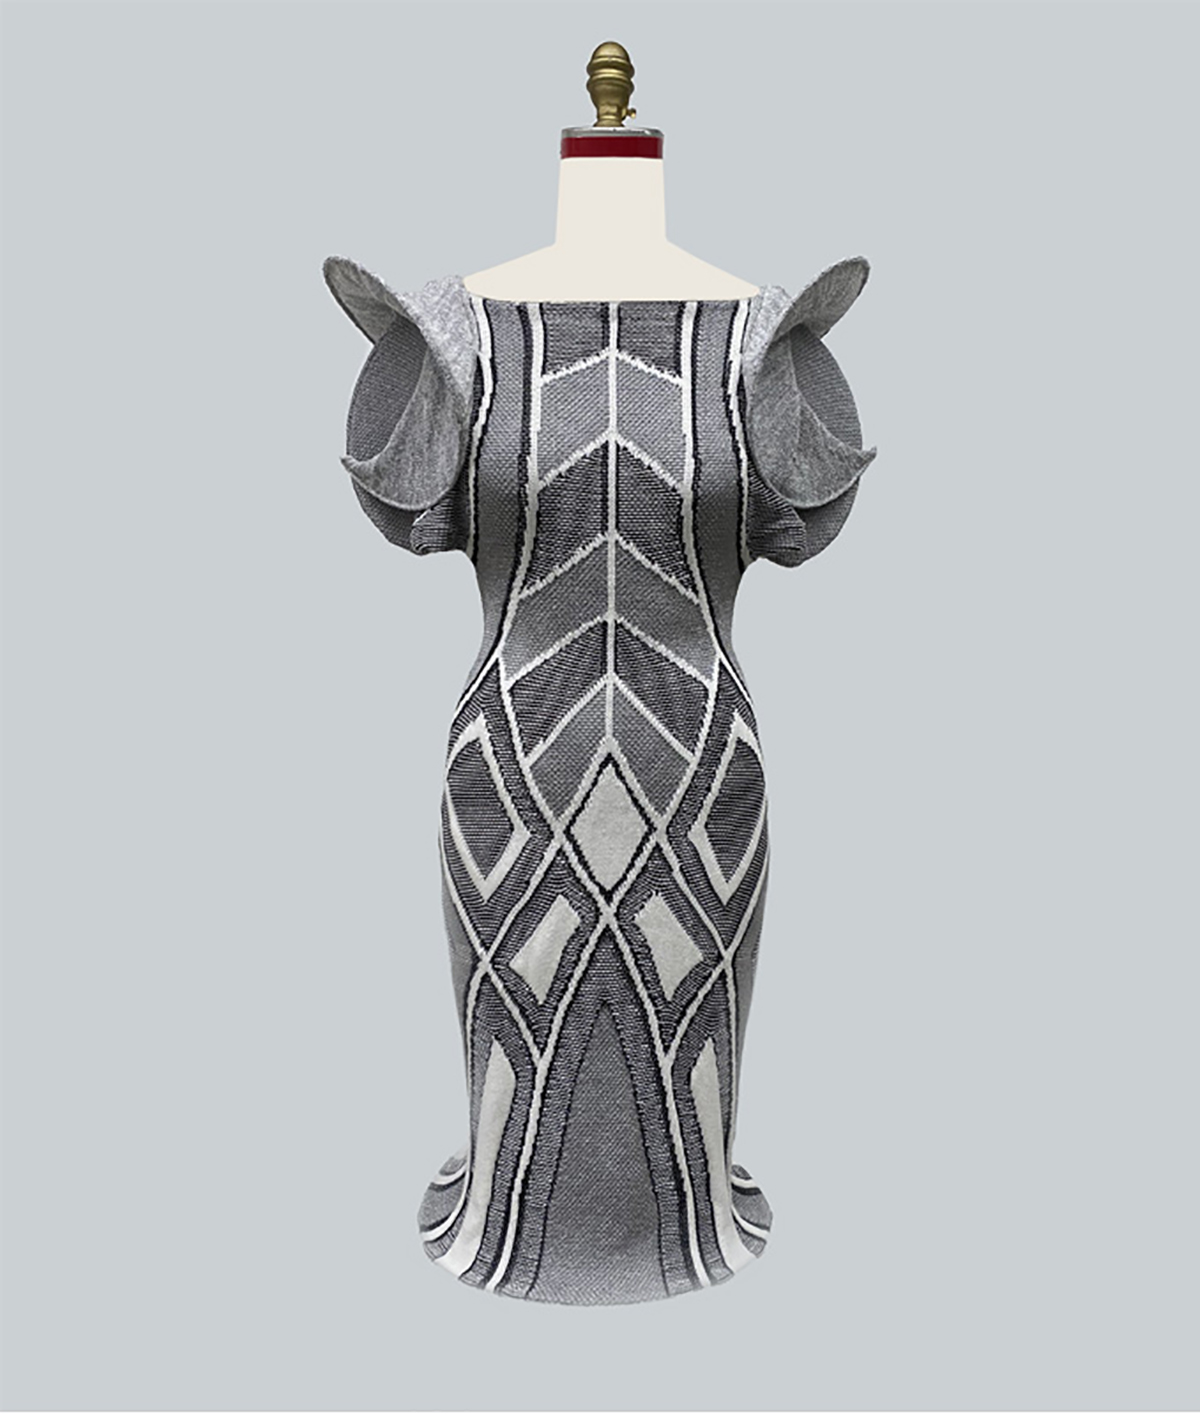 Metallic silver and white Zaha Hadid inspired skyscraper evening dress